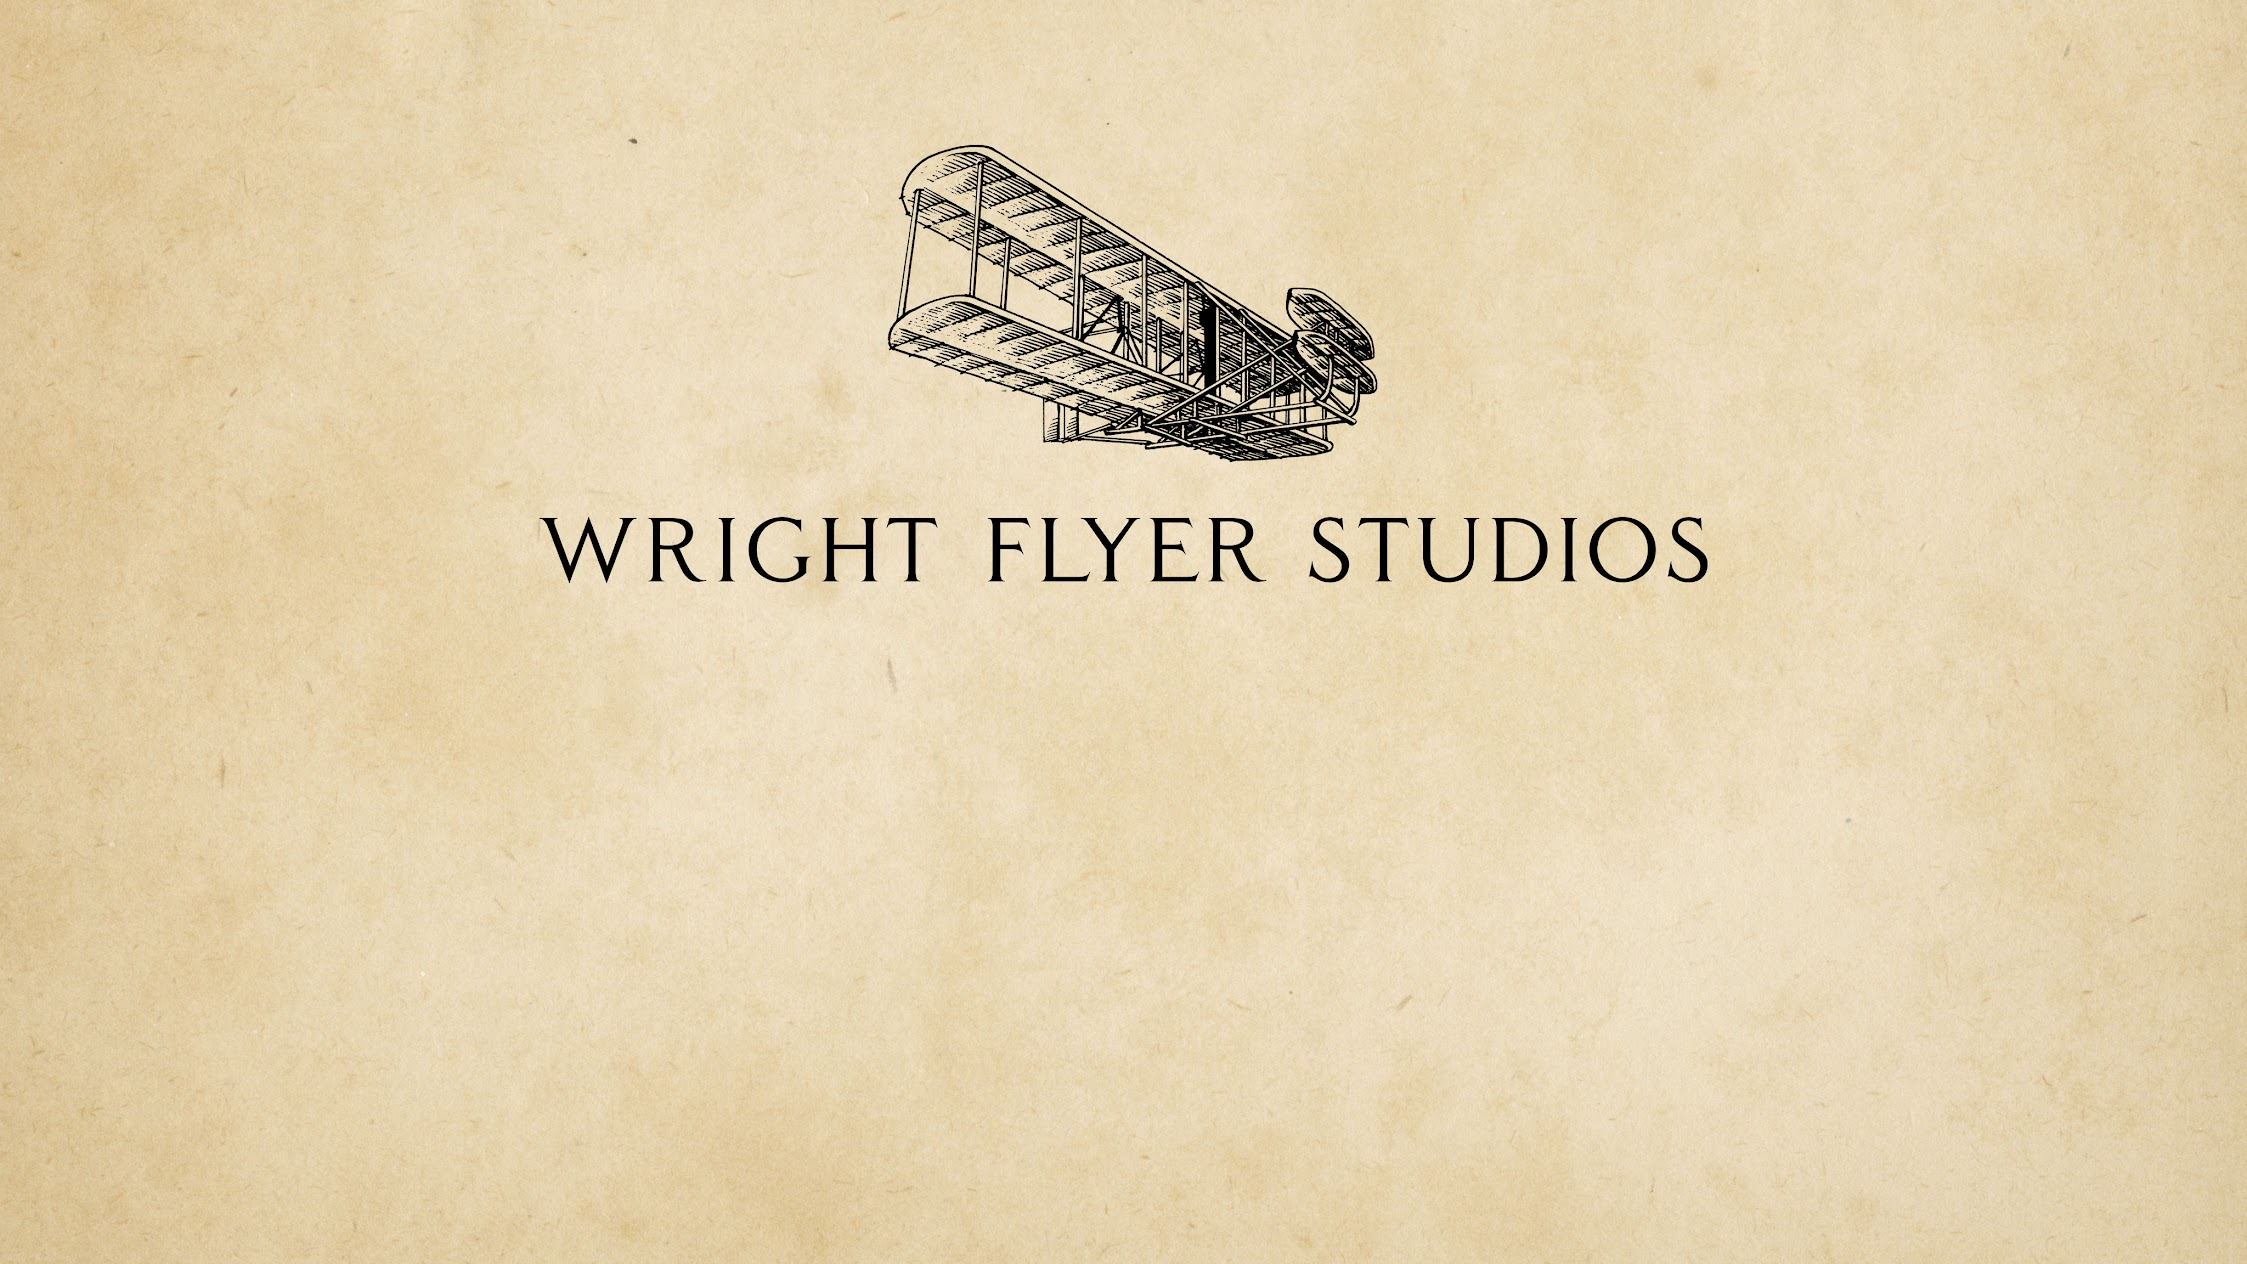 Wright Flyer Studios, Inc.